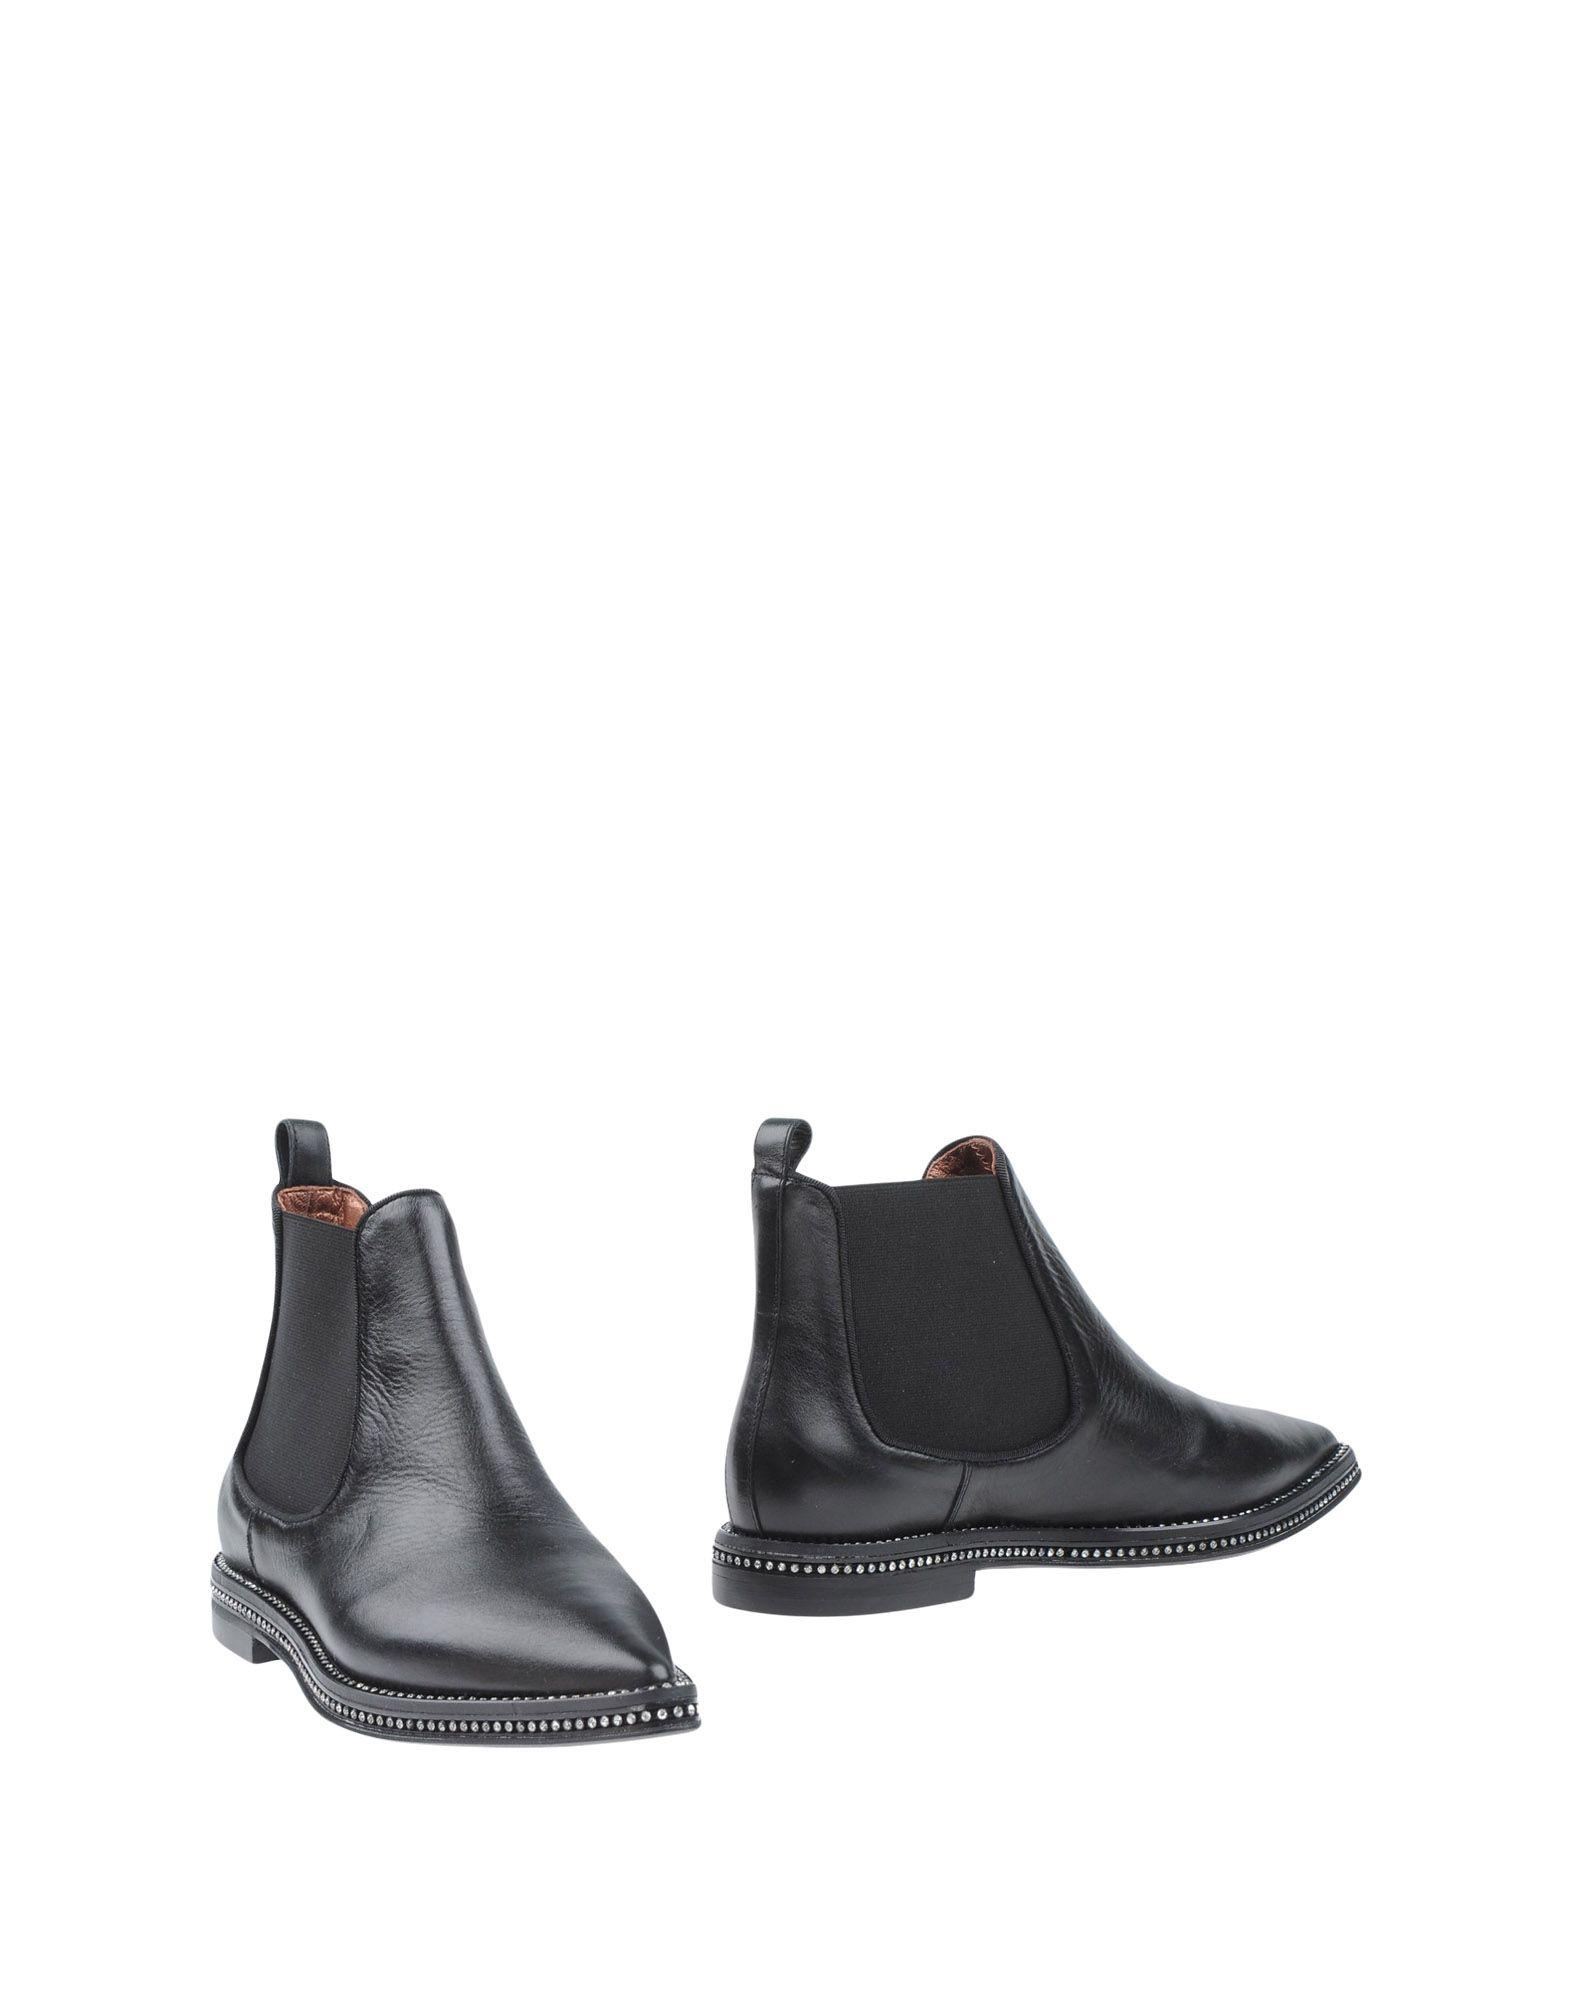 RAS Полусапоги и высокие ботинки magazzini del sale полусапоги и высокие ботинки